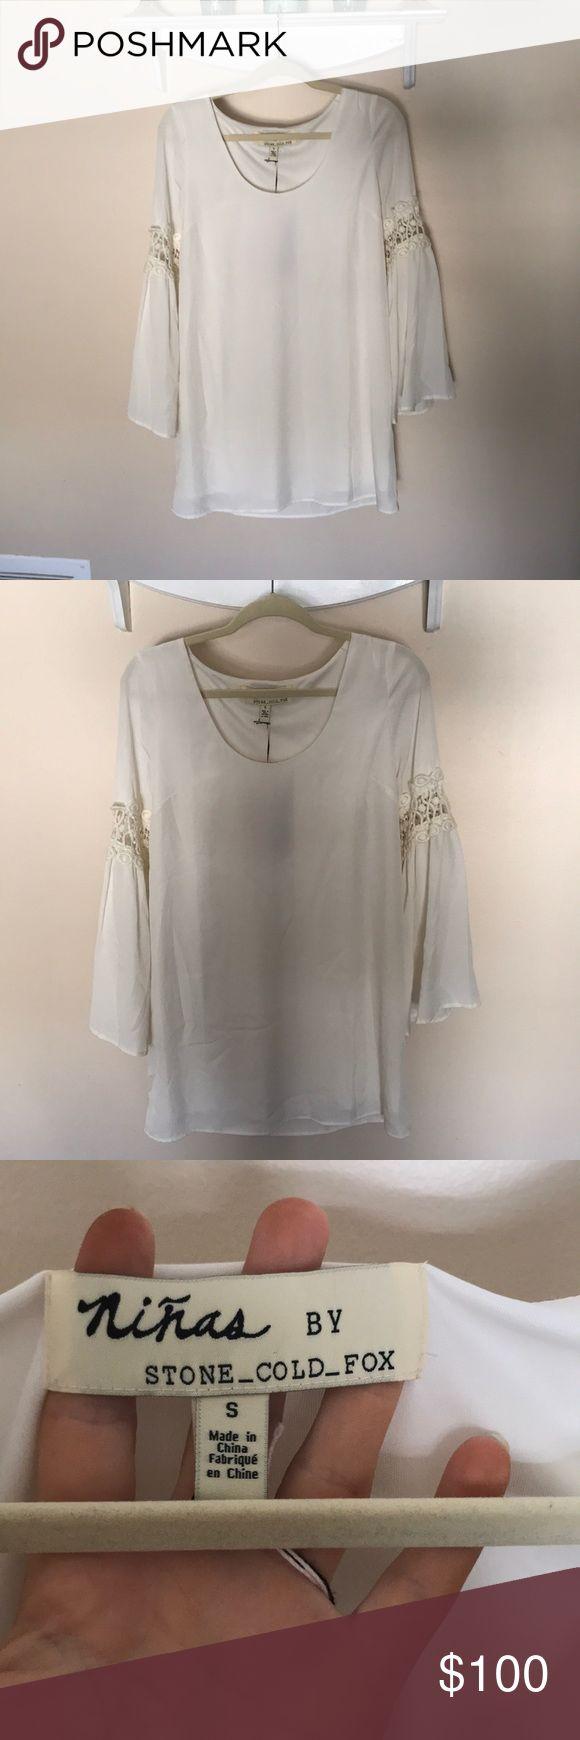 Niñas by Stone Cold Fox White Crochet Bell Sleeve Mini dress. NWT. Stone Cold Fox. Bell sleeve with crochet detail. Stone Cold Fox Dresses Mini